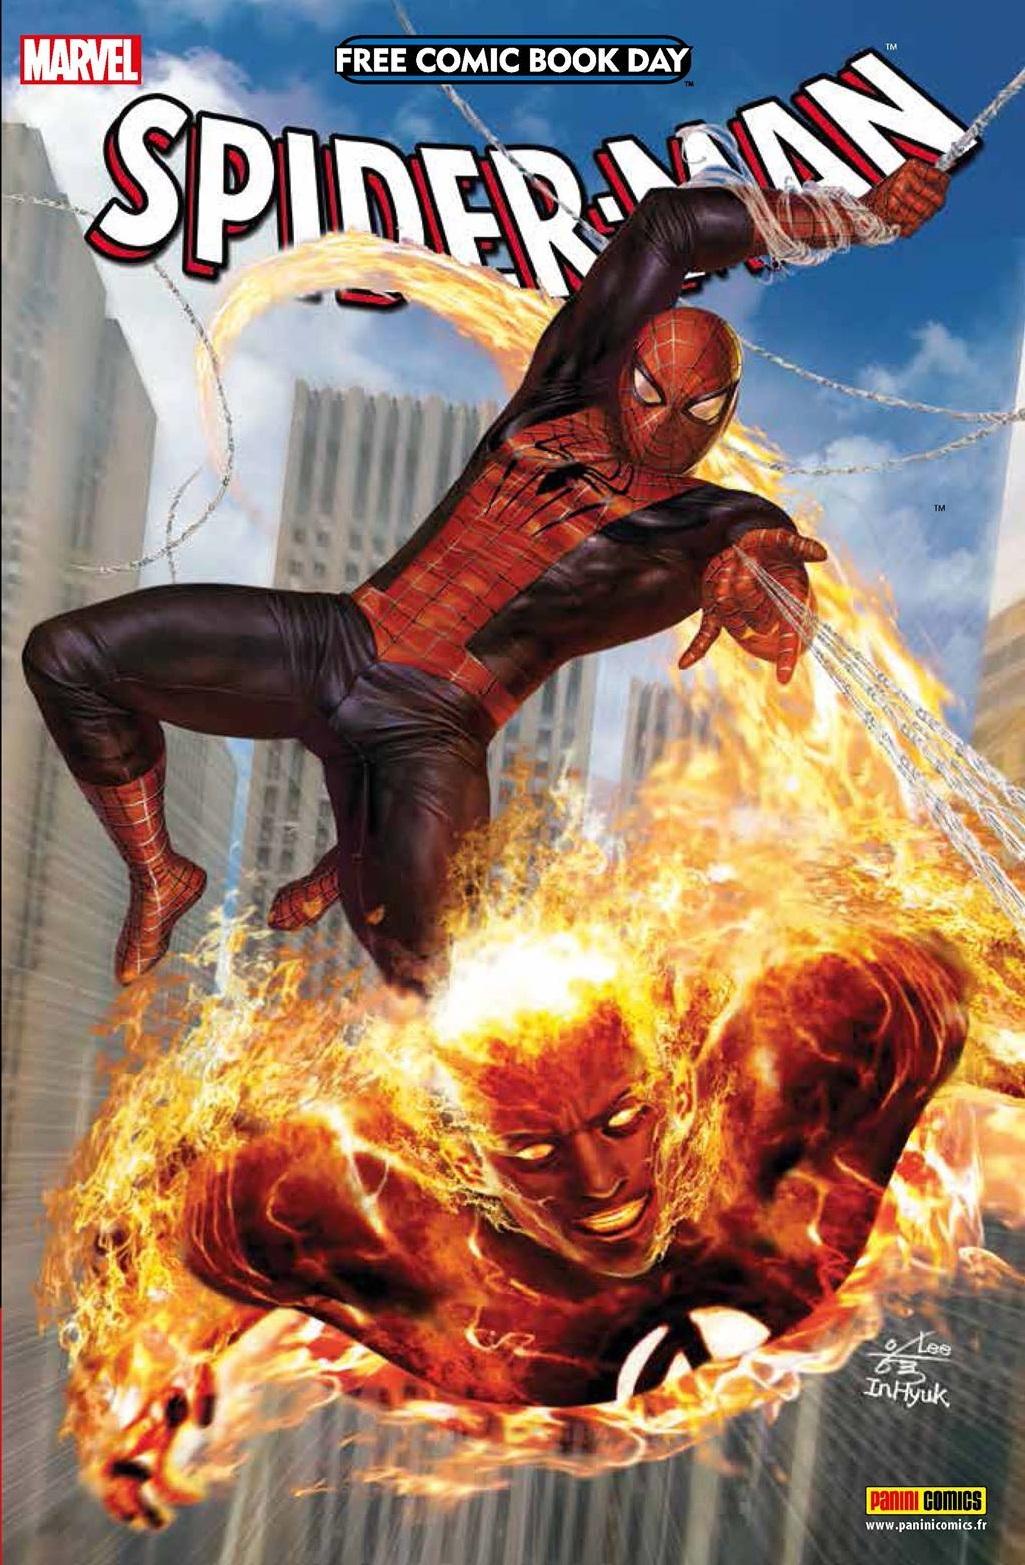 FCBD2014 - SPIDER-MAN